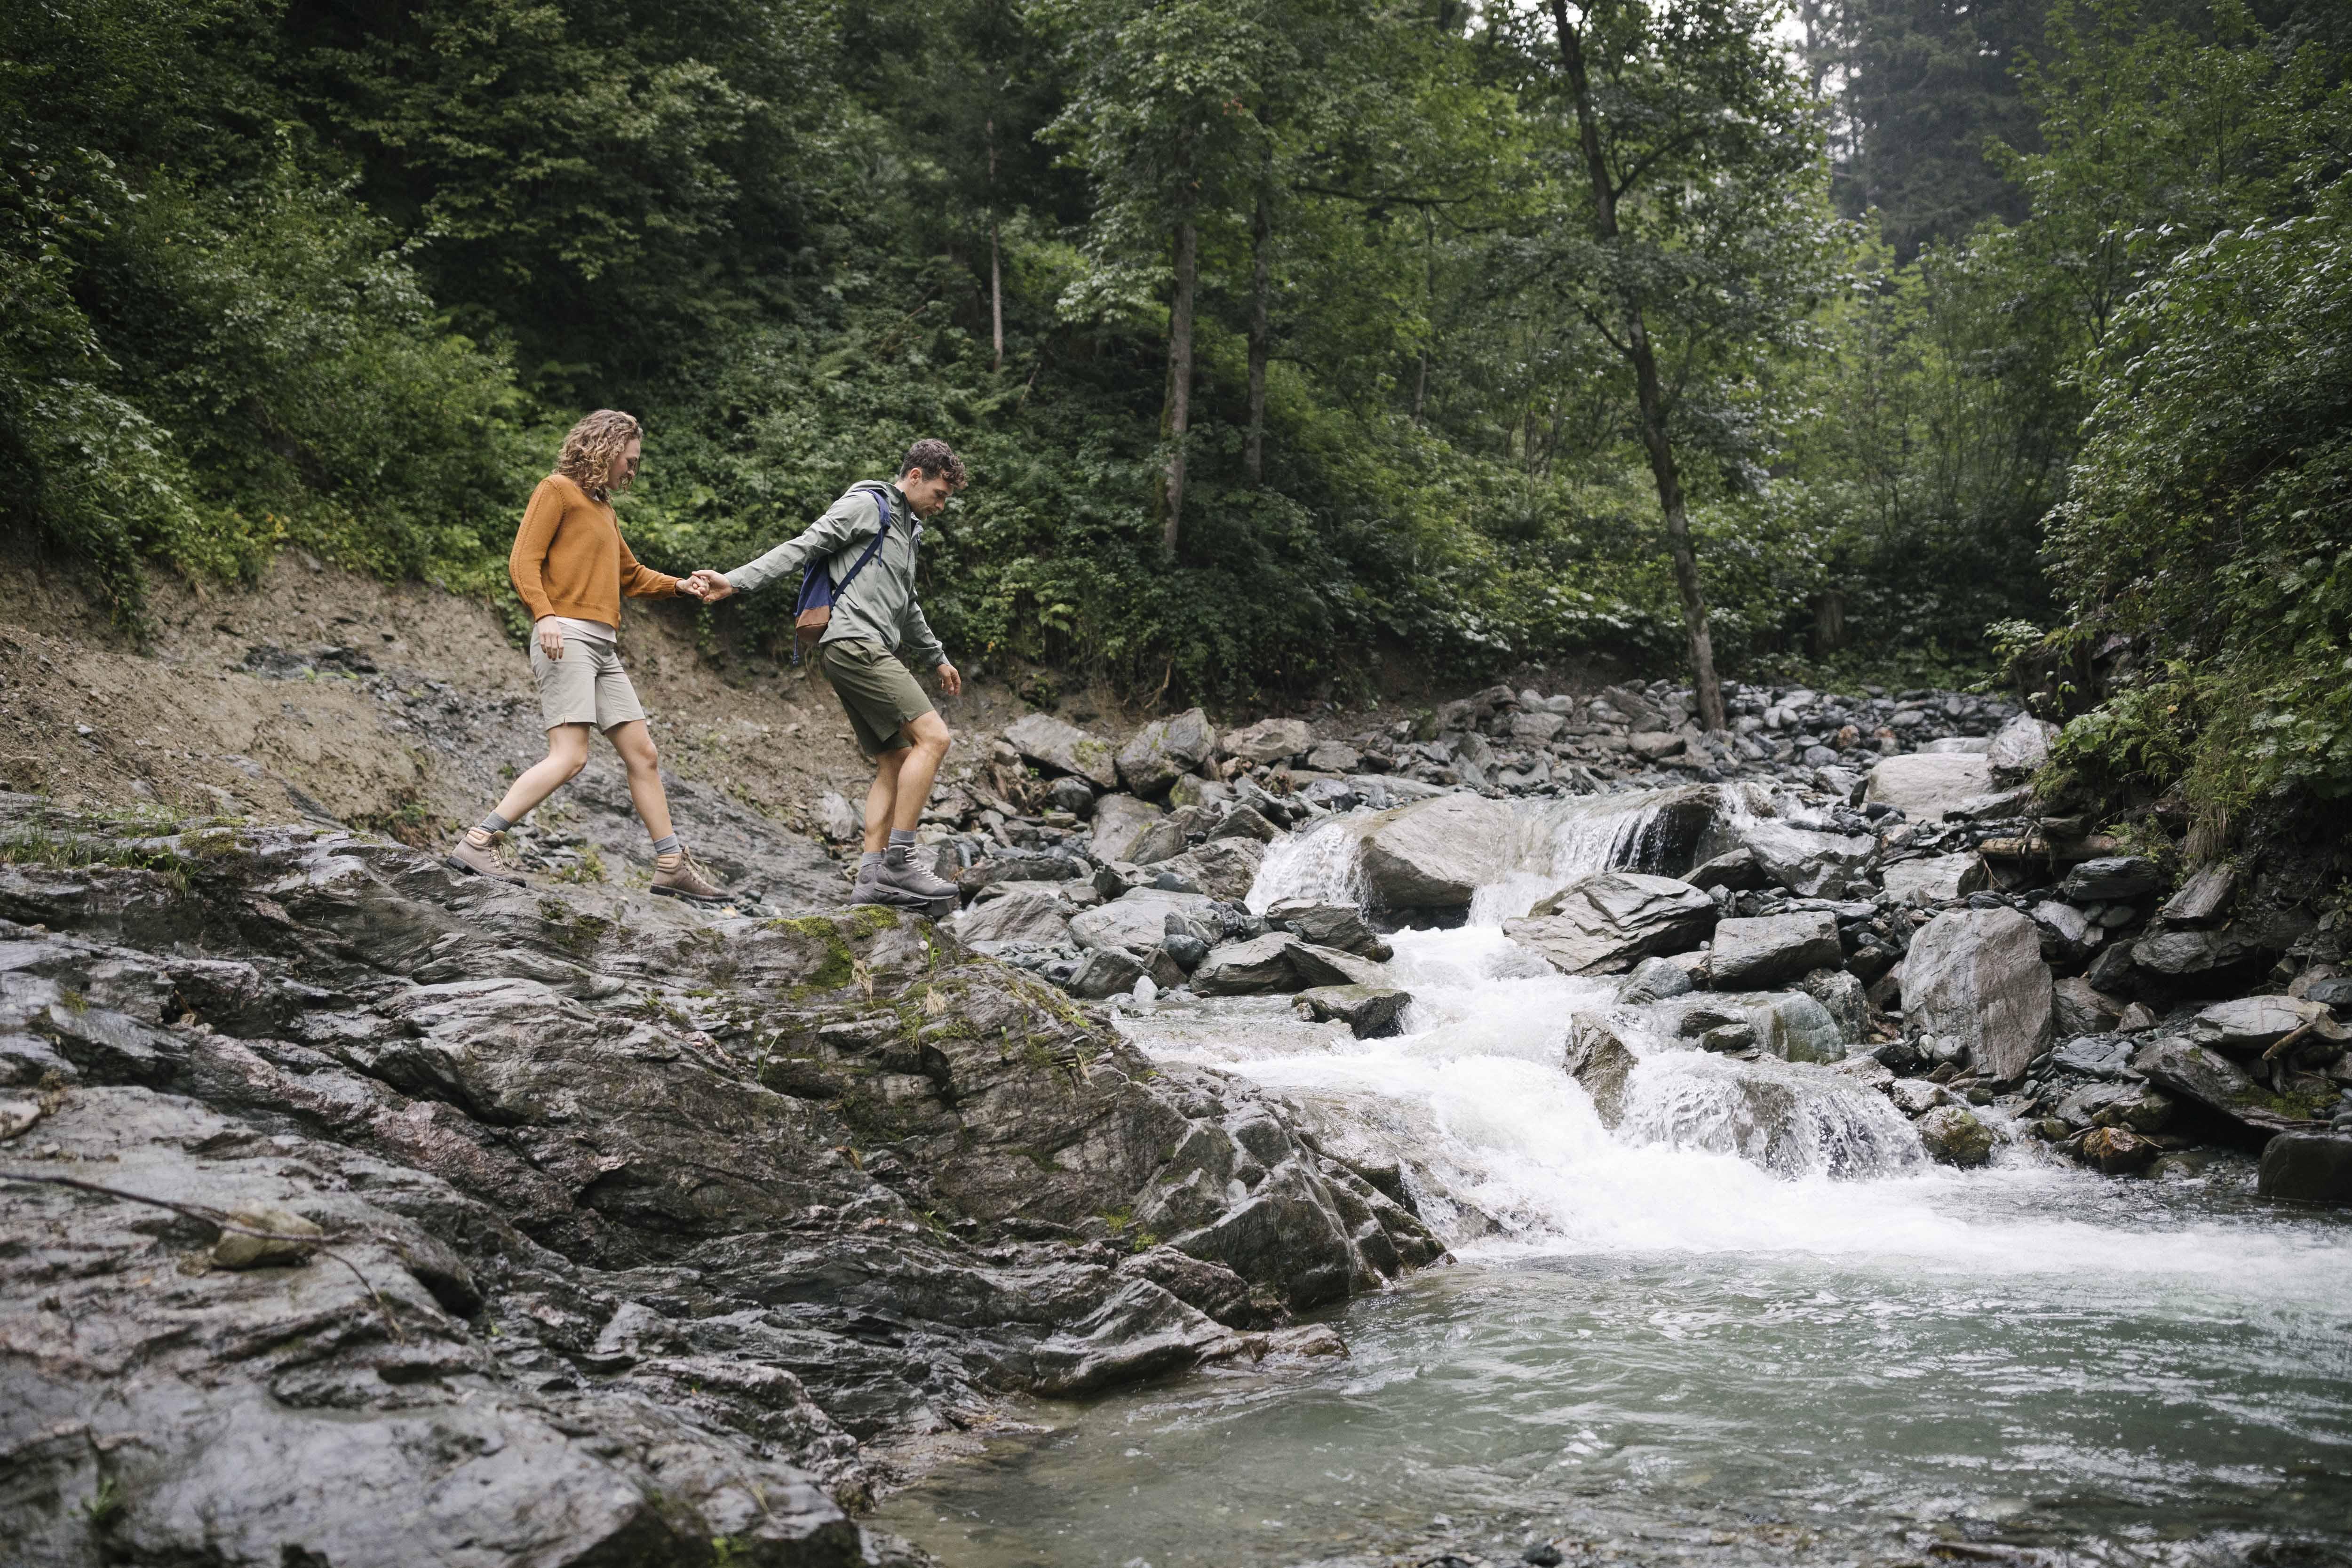 Escursione al torrente, © Kitzbuehel Tourismus -Cosa vedere a Kitzbuhel